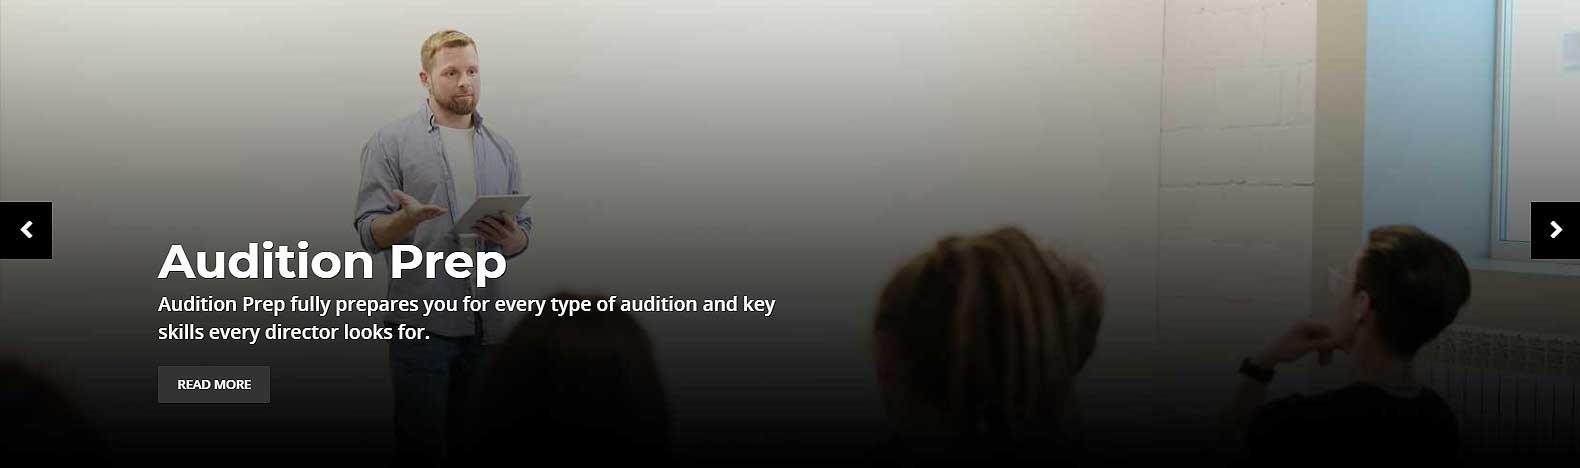 audition prep